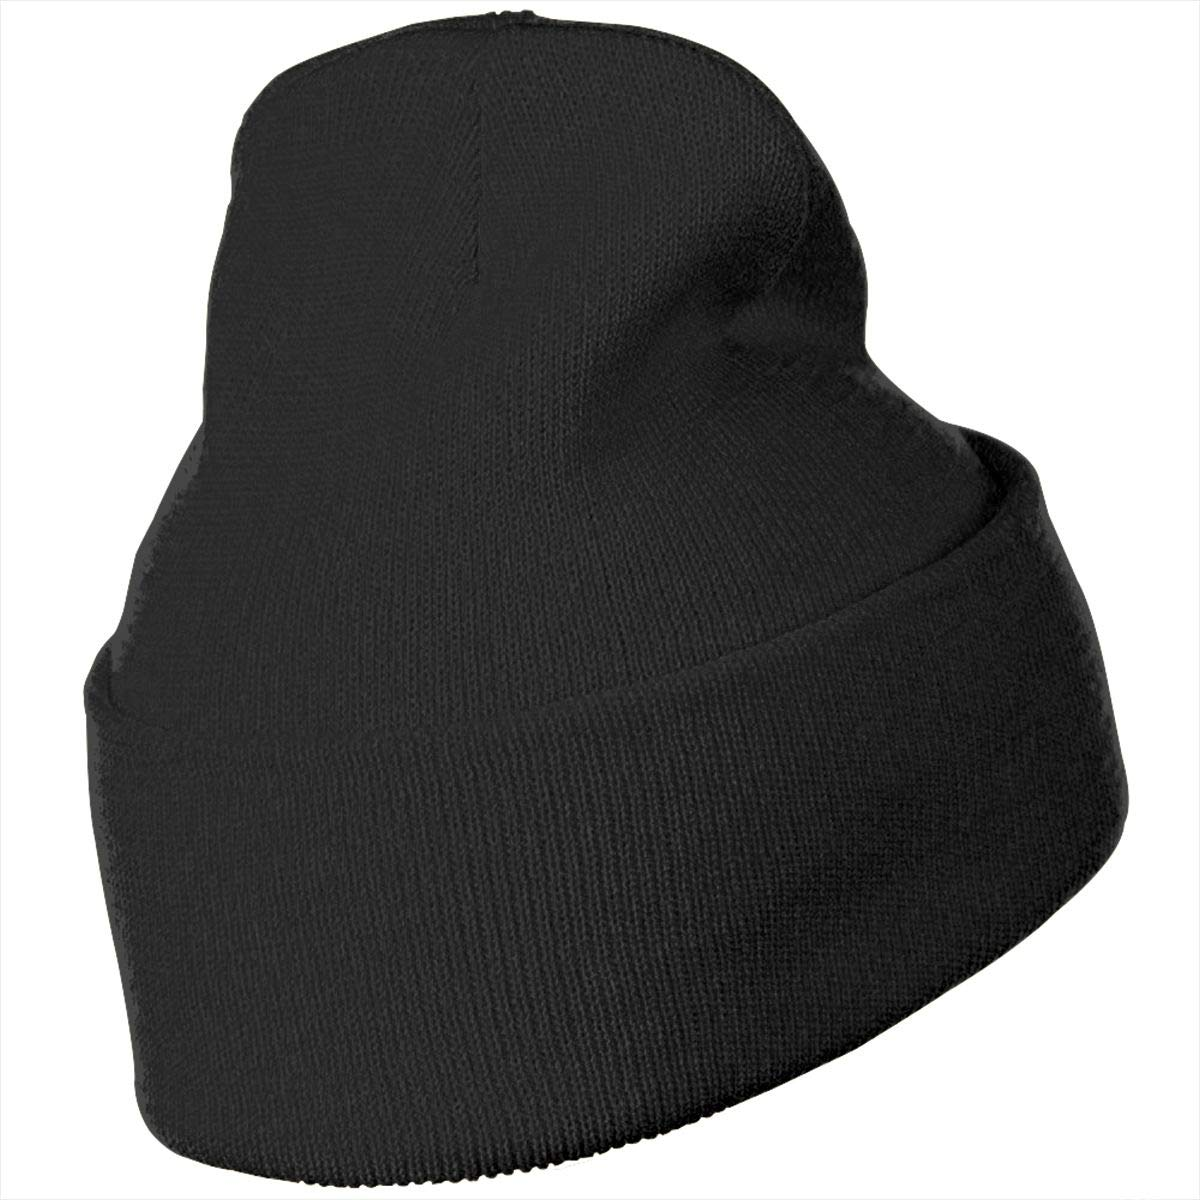 JimHappy Recession Santa Winter Warm Hats,Knit Slouchy Thick Skull Cap Black